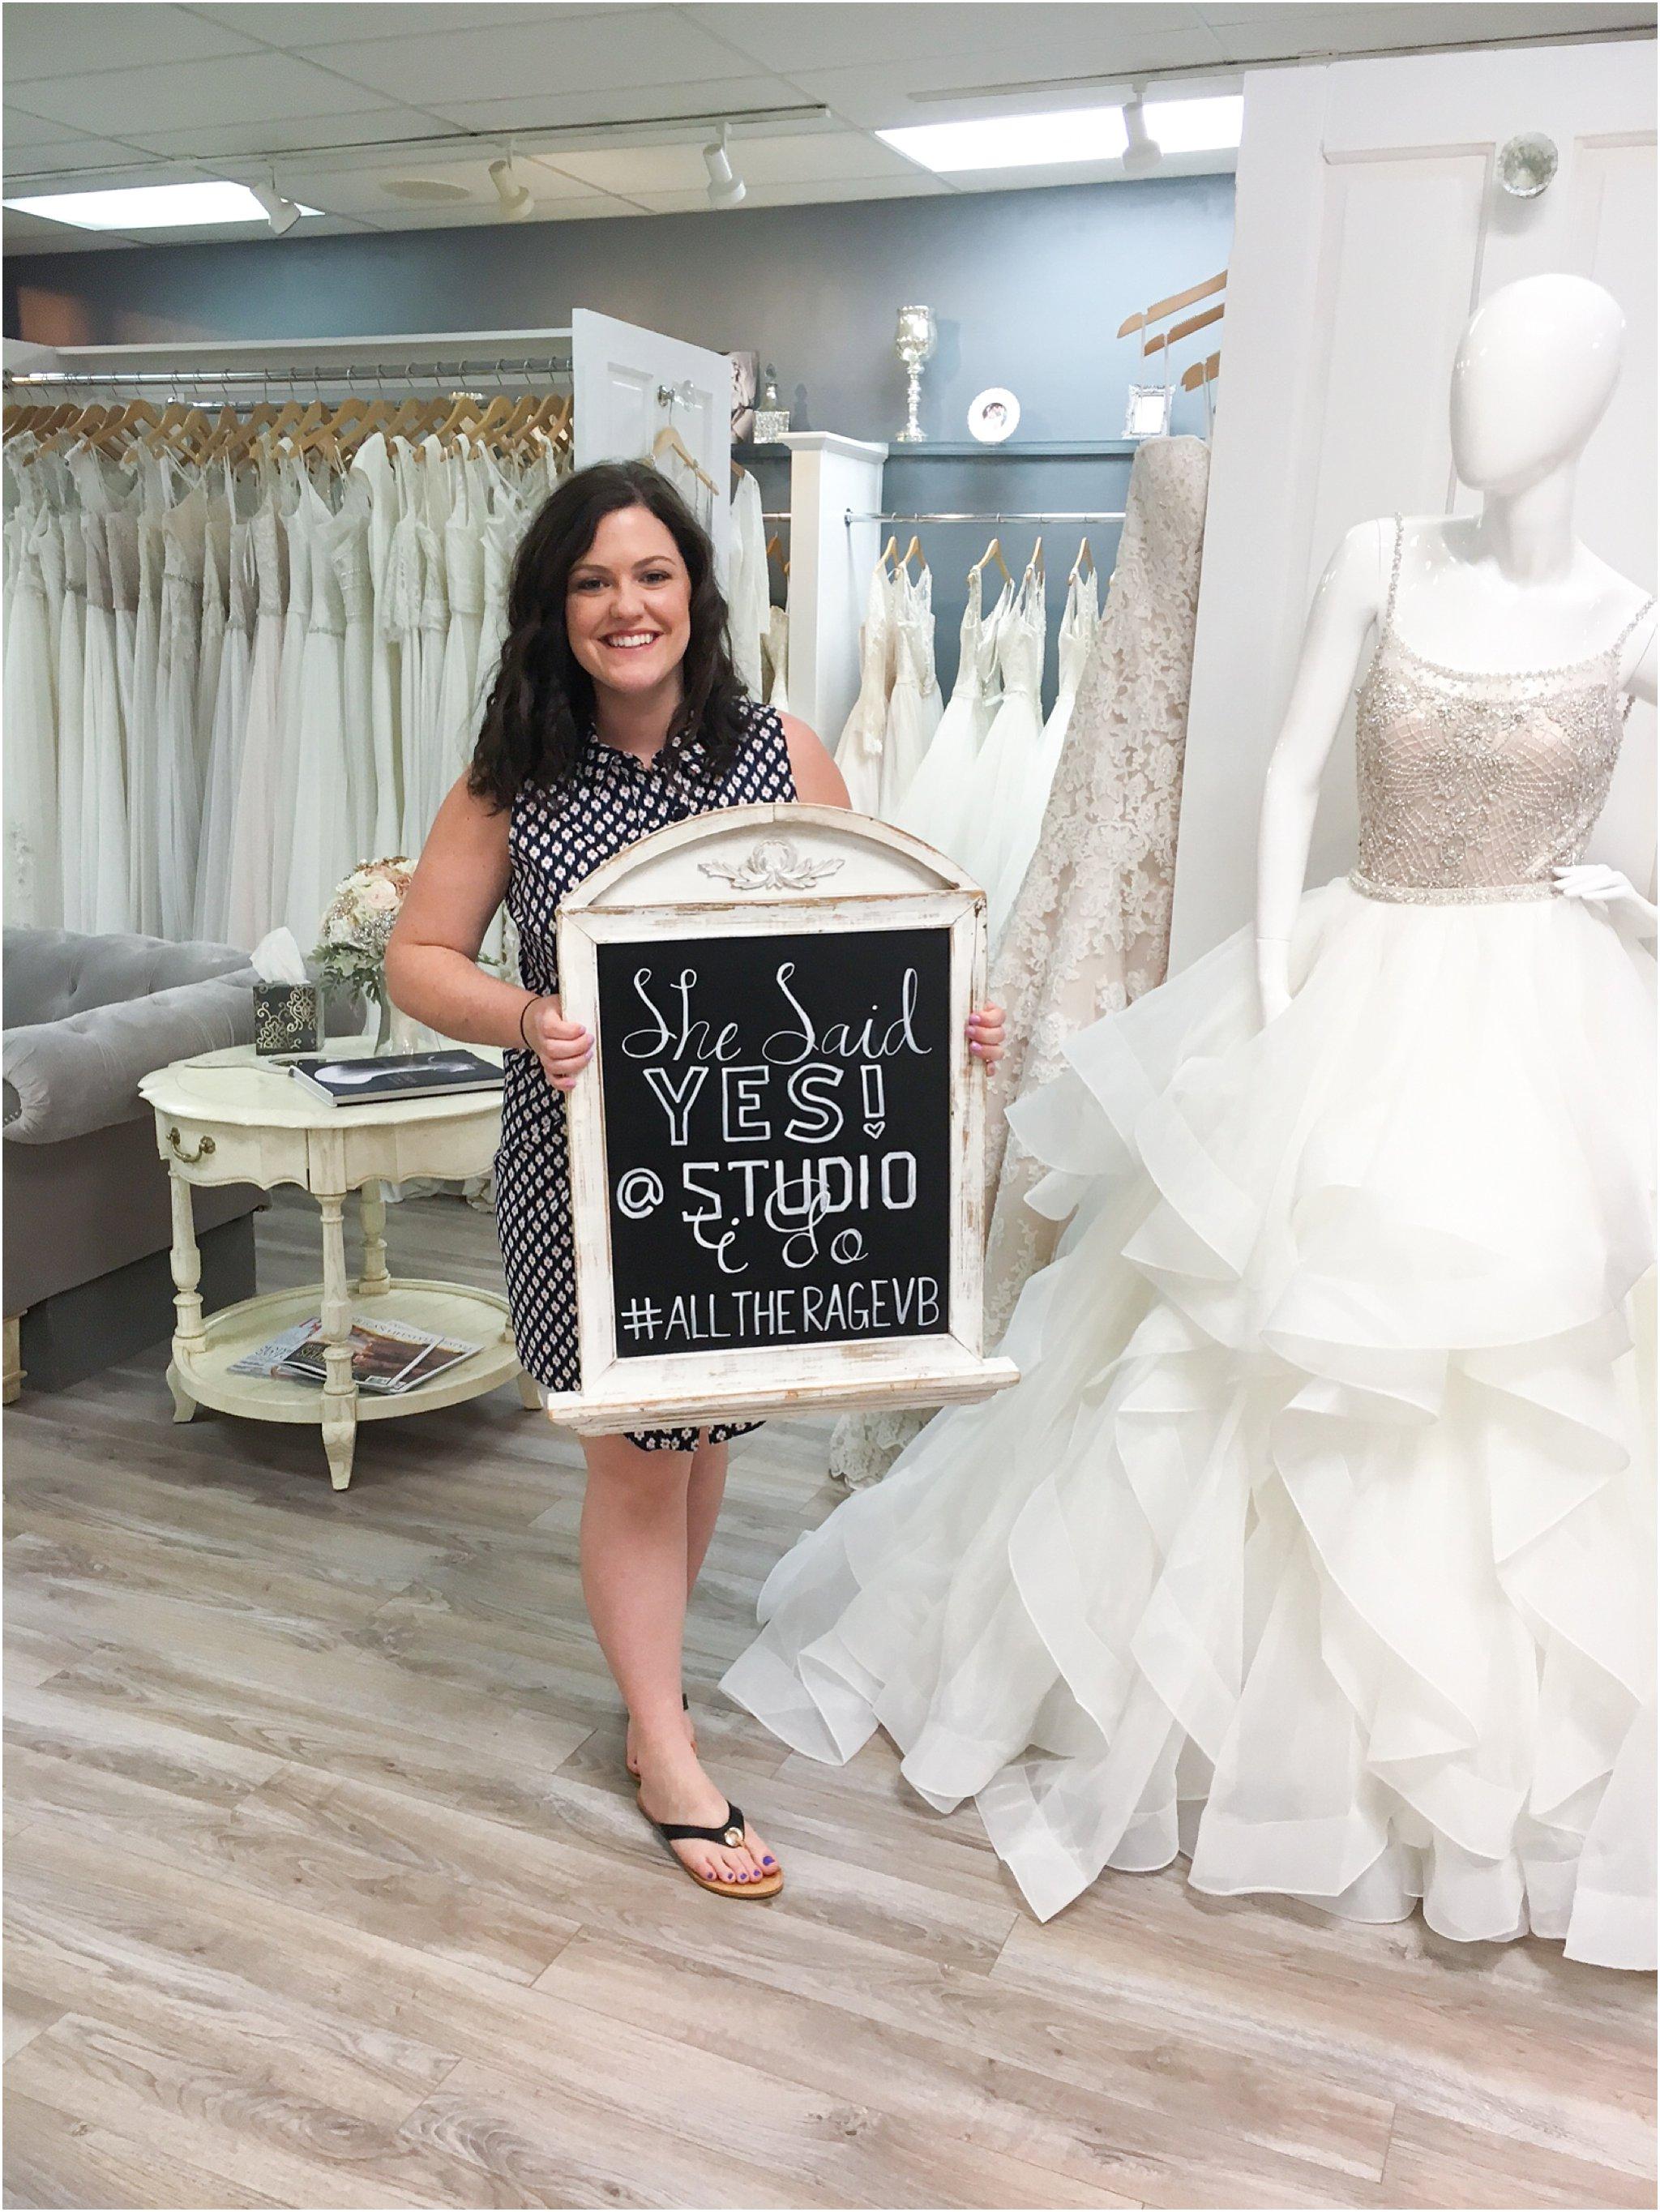 studio i do wedding dress she said yes to the dress sign